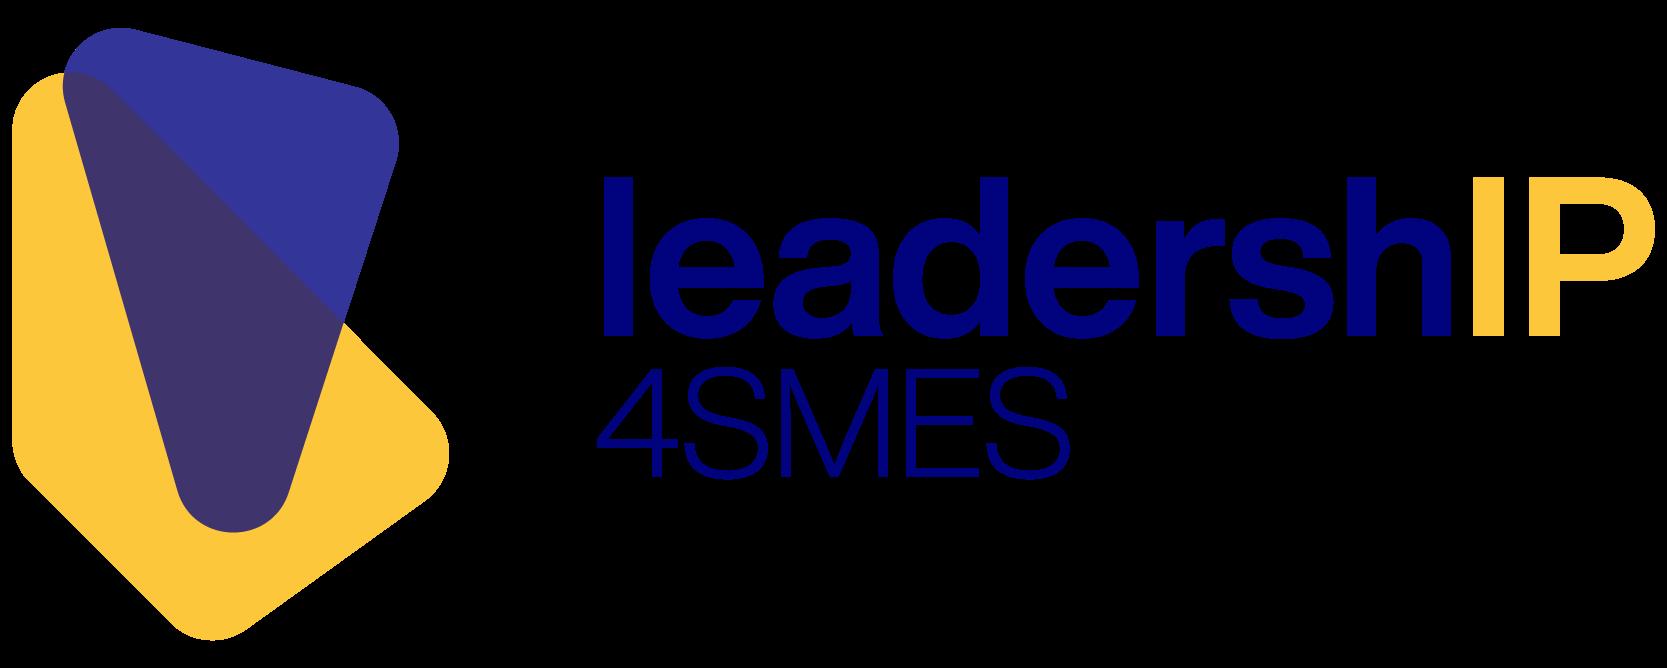 LEADERSHIP4SMEs